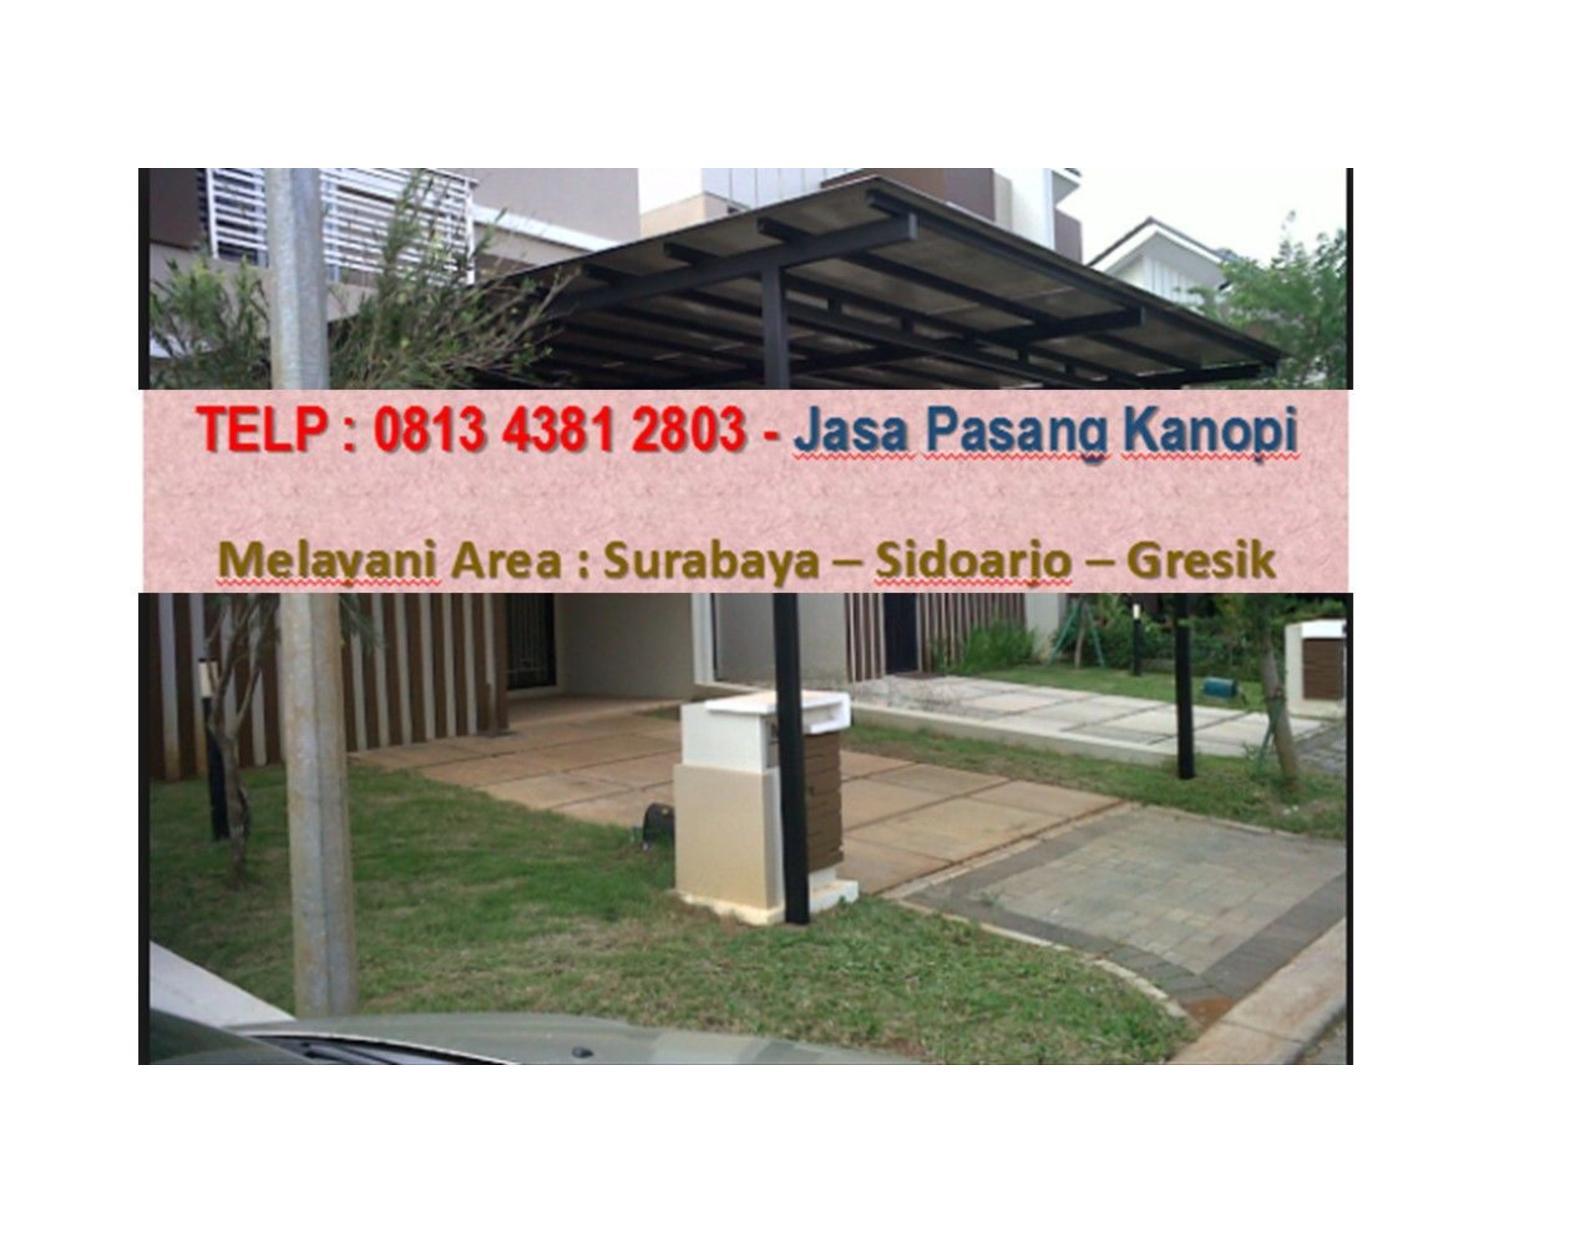 canopy baja ringan tanpa tiang calameo telp wa 0813 4381 2803 kanopi sidoarjo